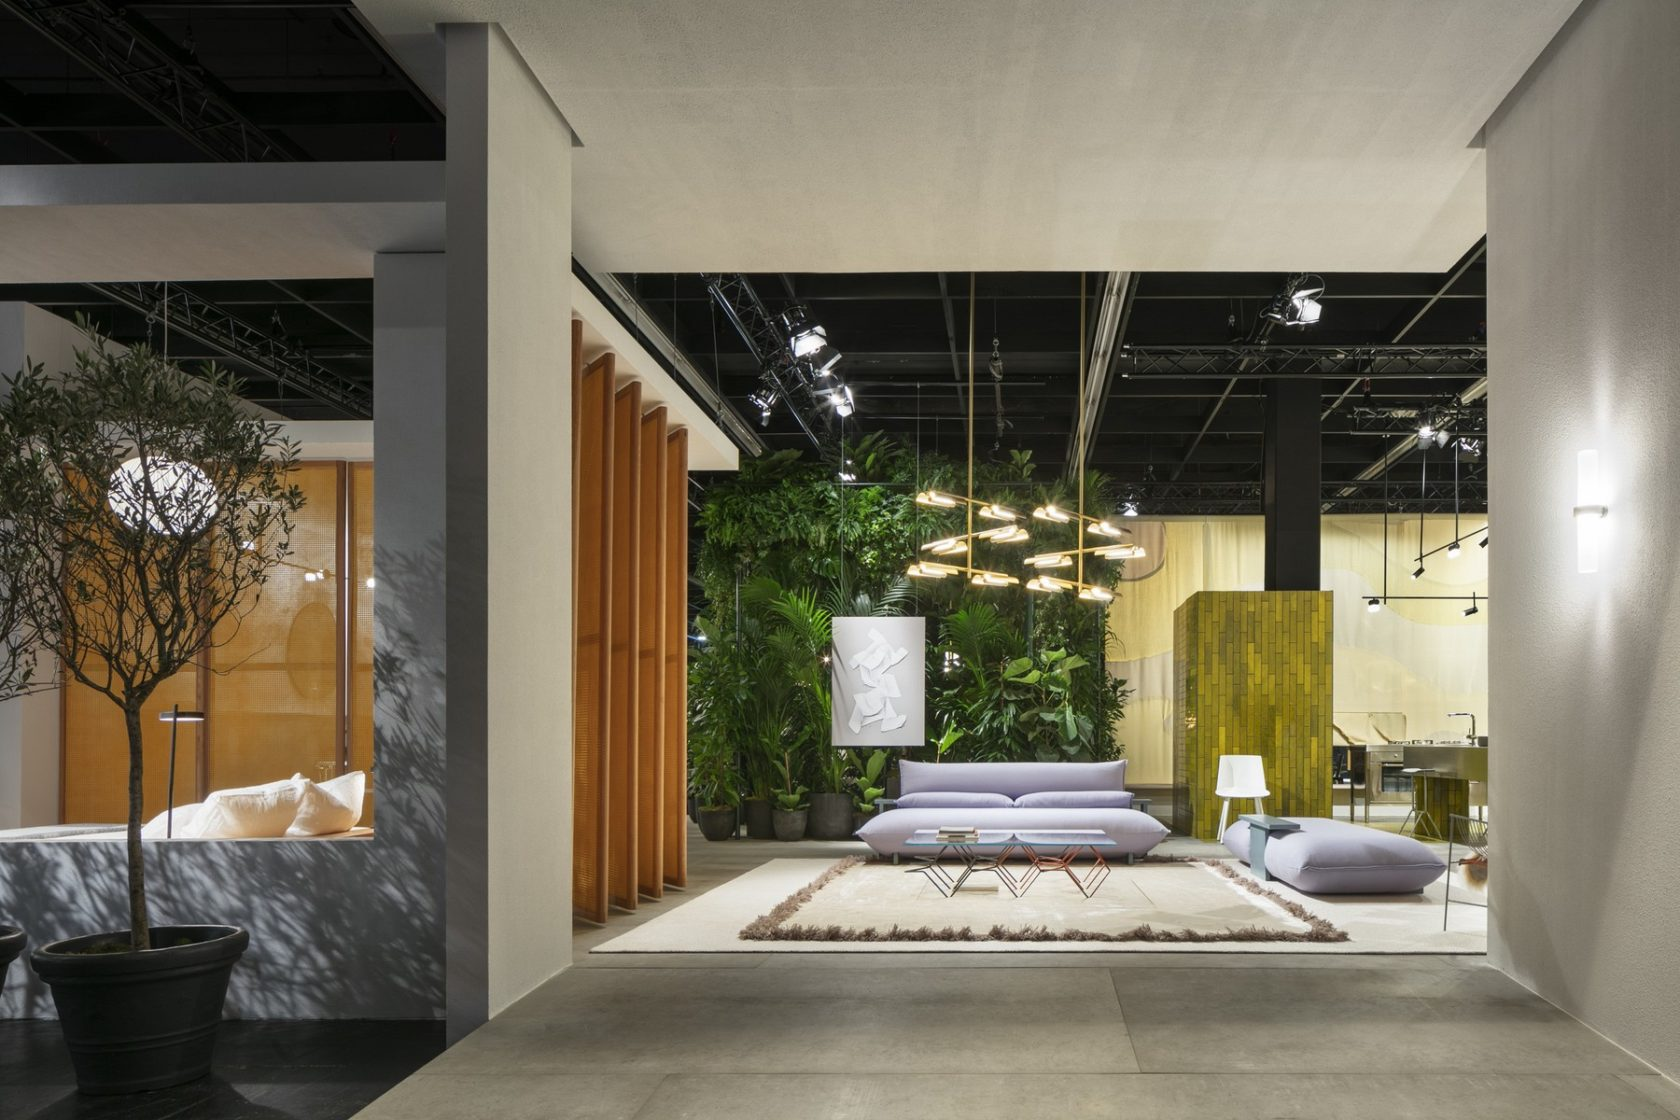 Imm Cologne 2019 Koelnmesse Messe Messebau Das Haus 2019 Moebelmesse Interior Design 4